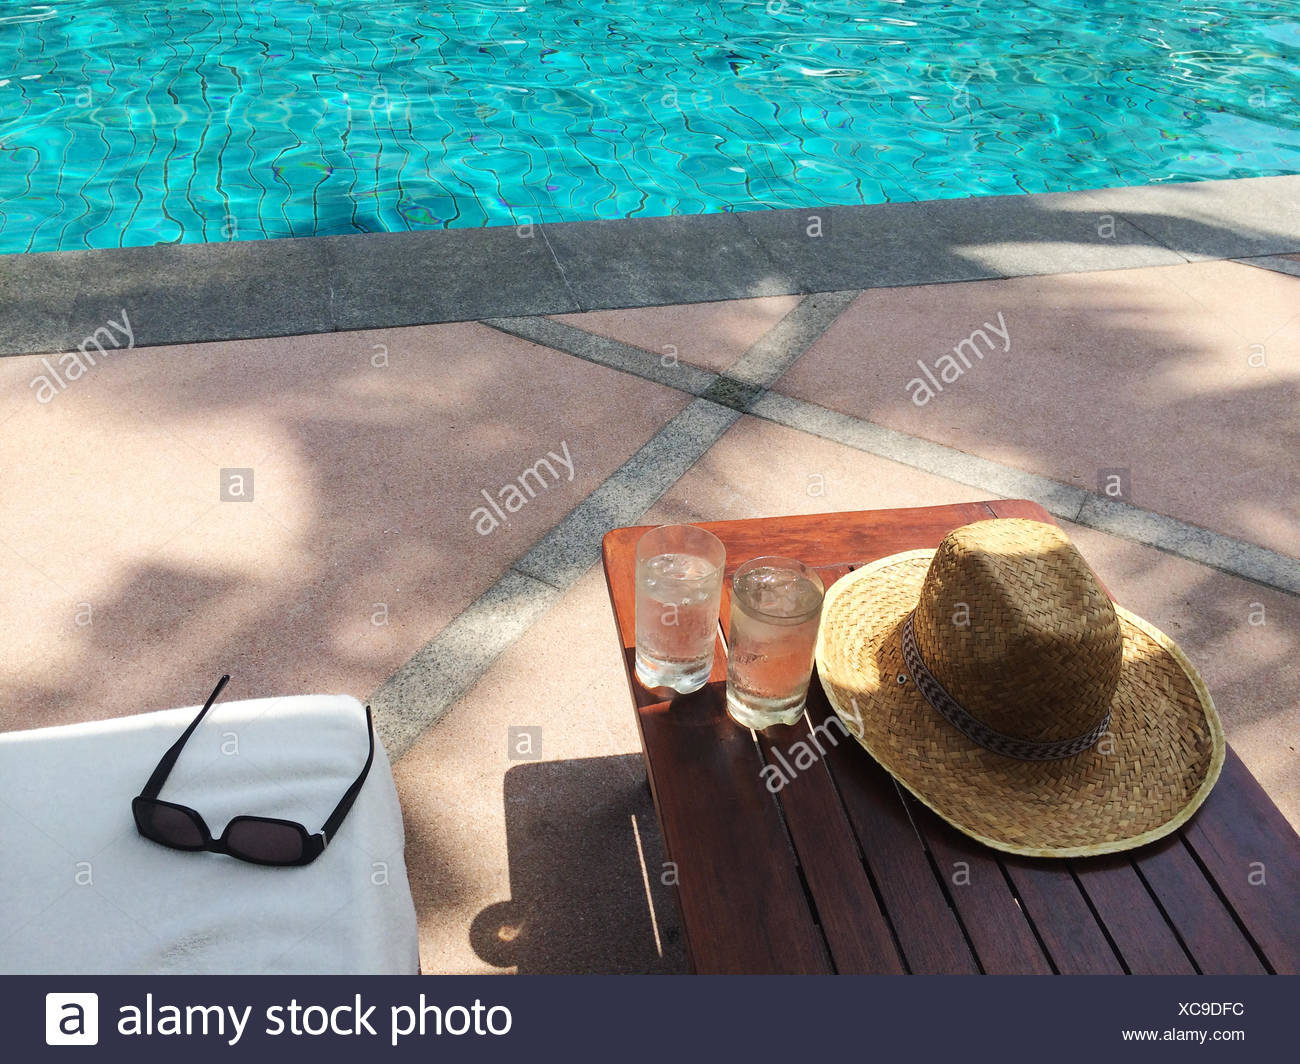 668e2744ccabd Paja sombrero para el sol